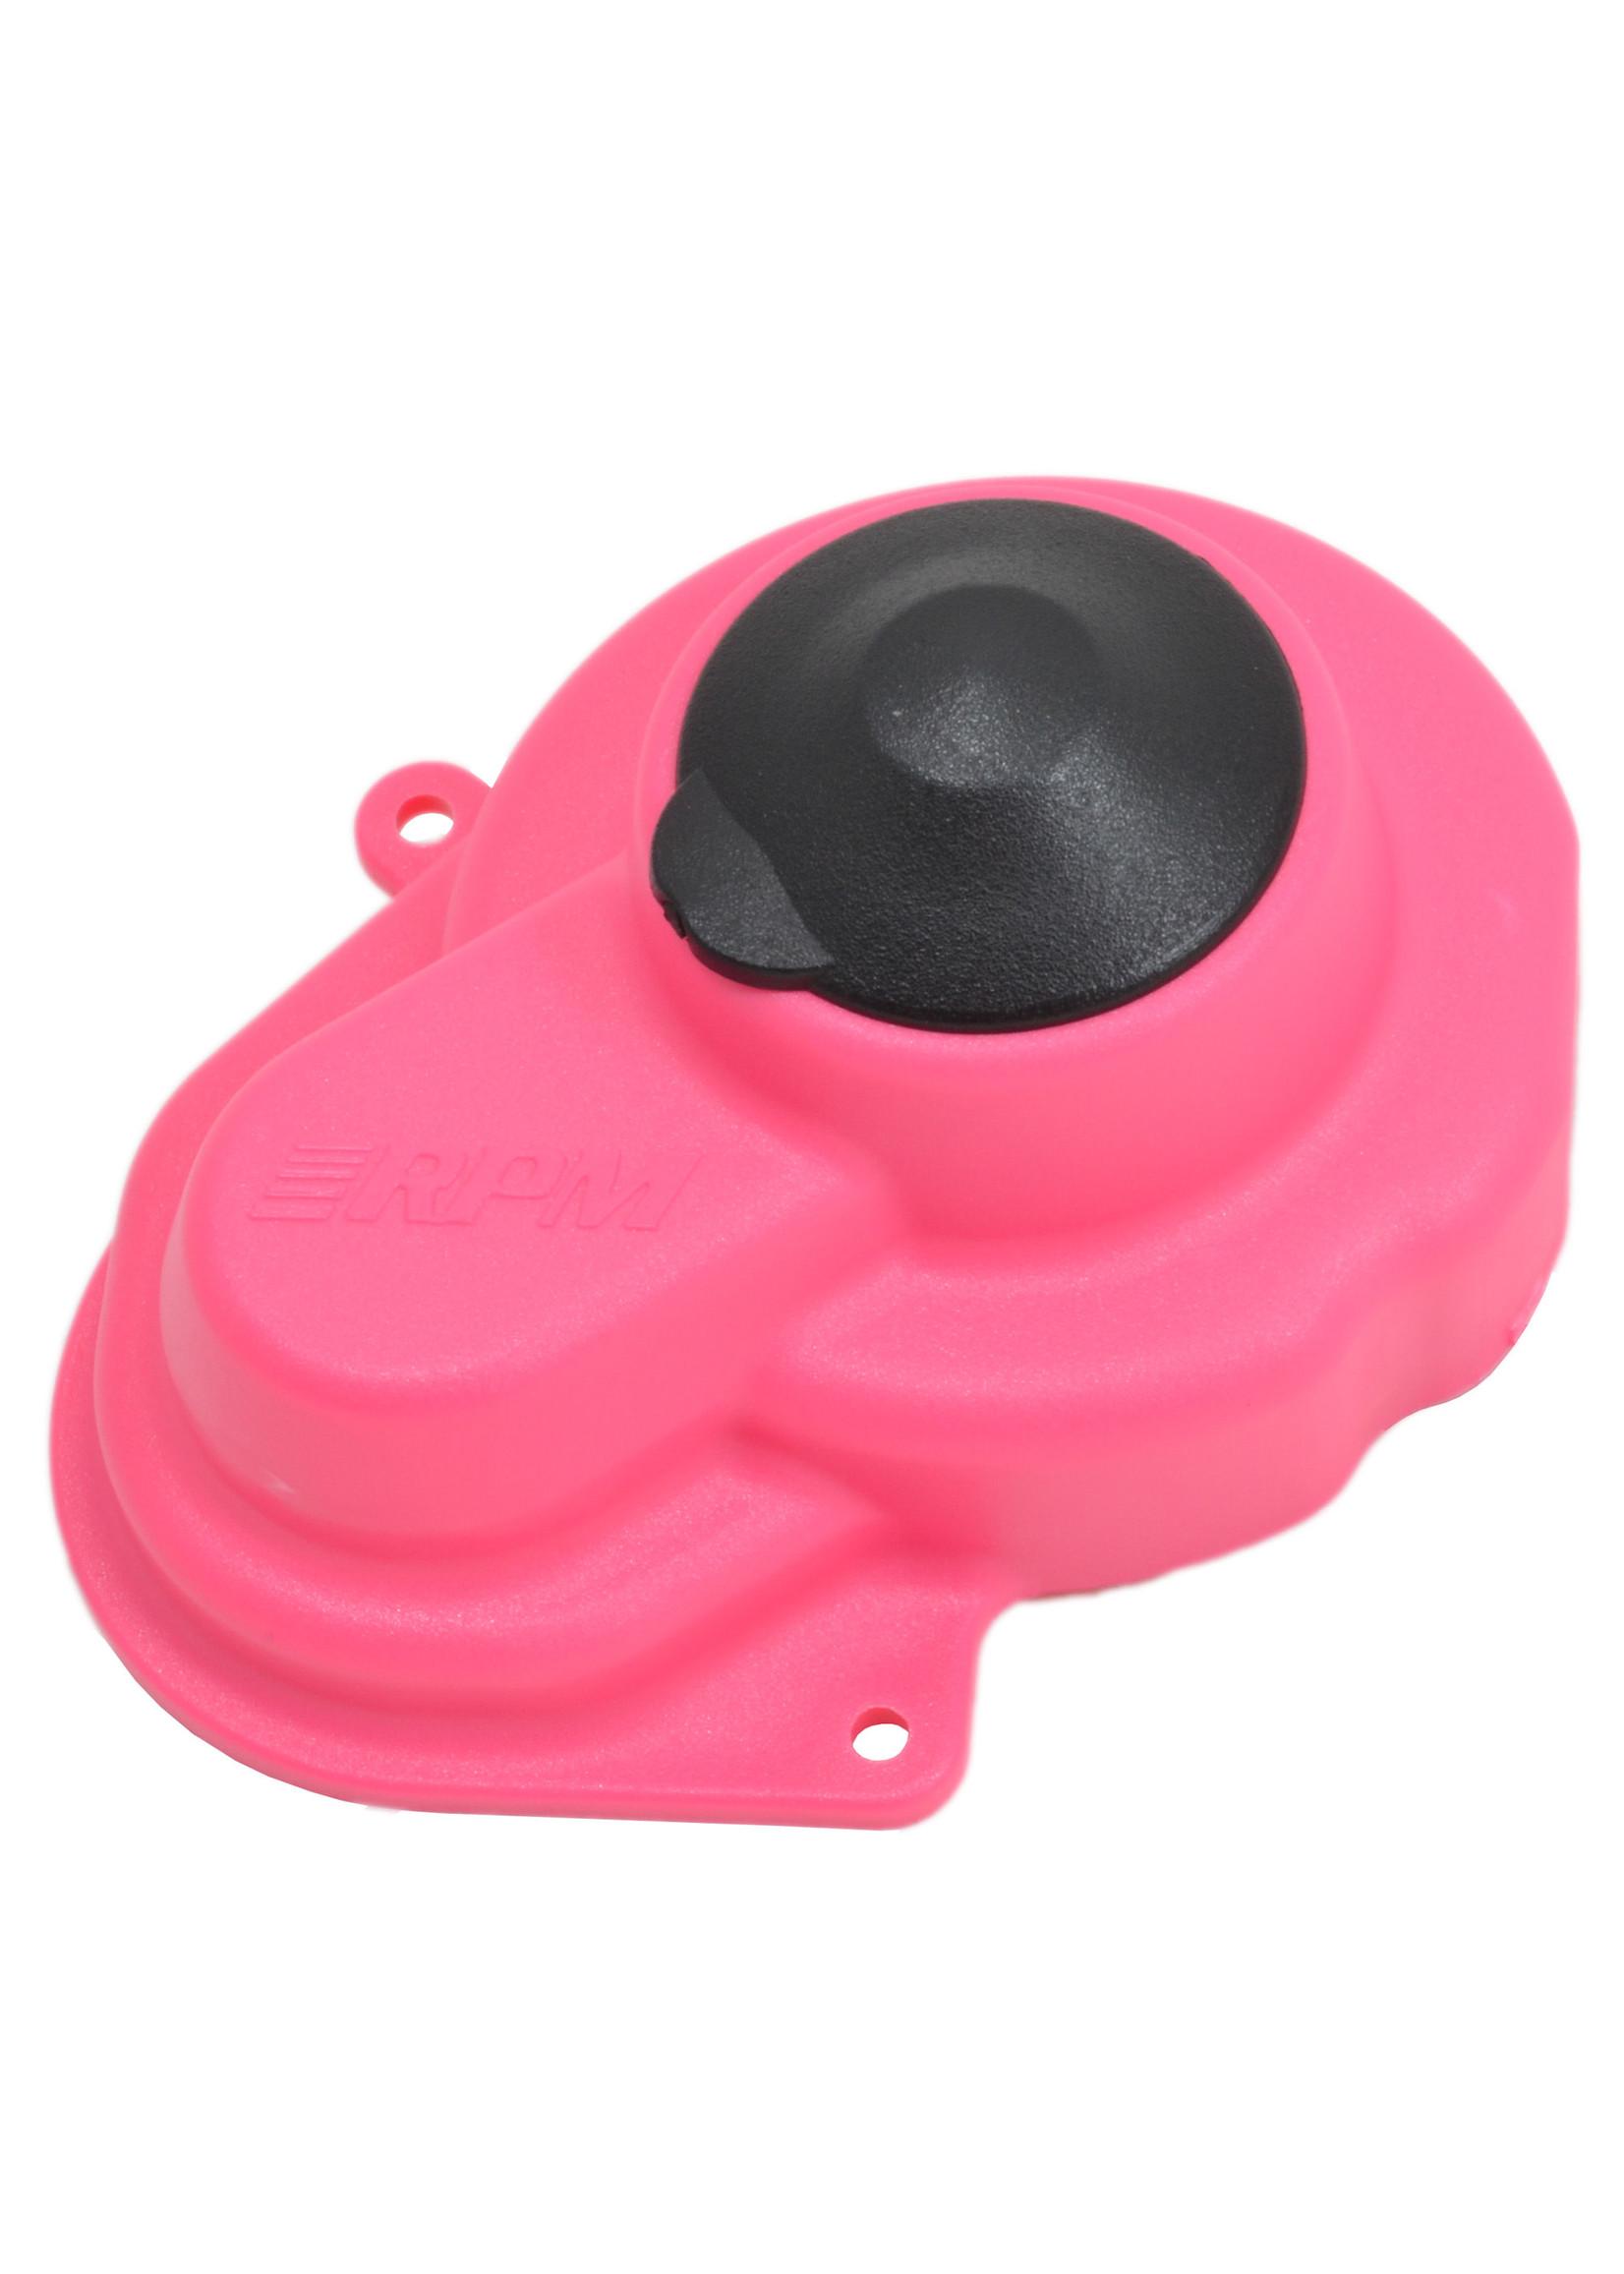 RPM RPM80527 RPM Sealed Gear Cover, for Traxxas Slash 2wd/eRustler/Stampede/Bandit, Pink